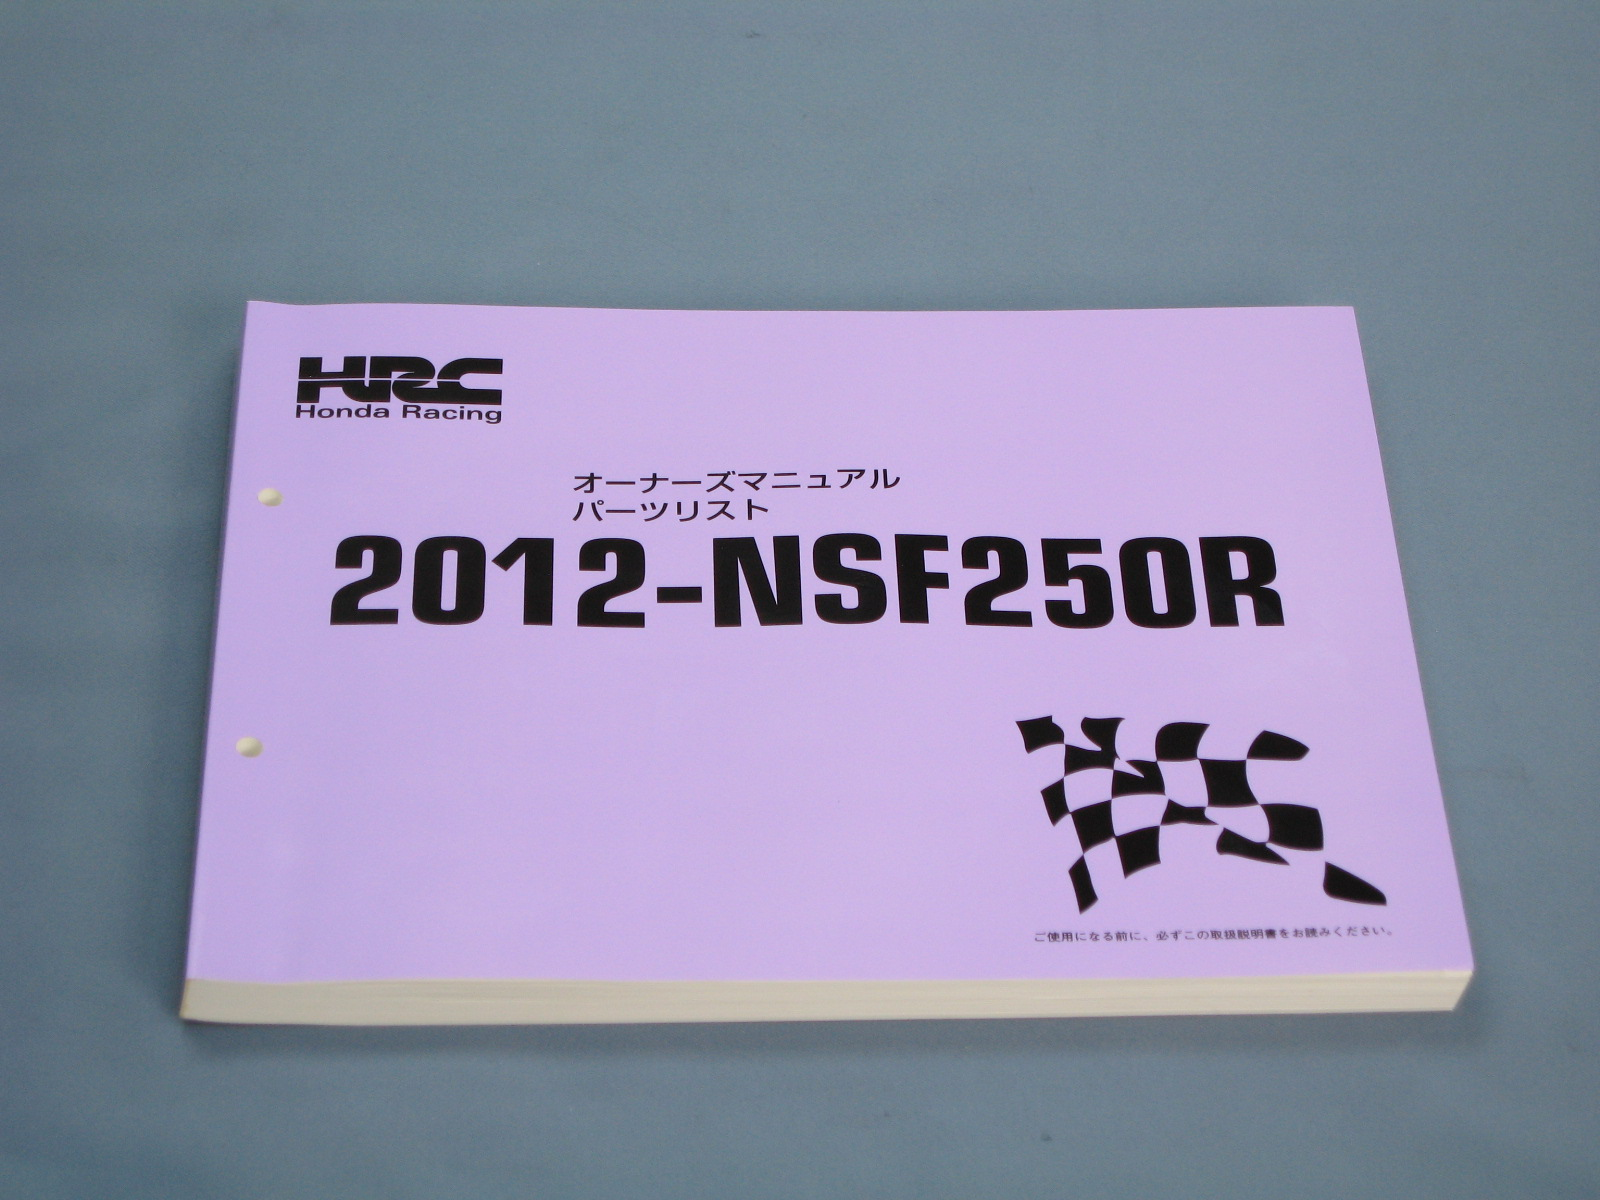 2012 NSF250R HRCマニュアル・パーツリスト